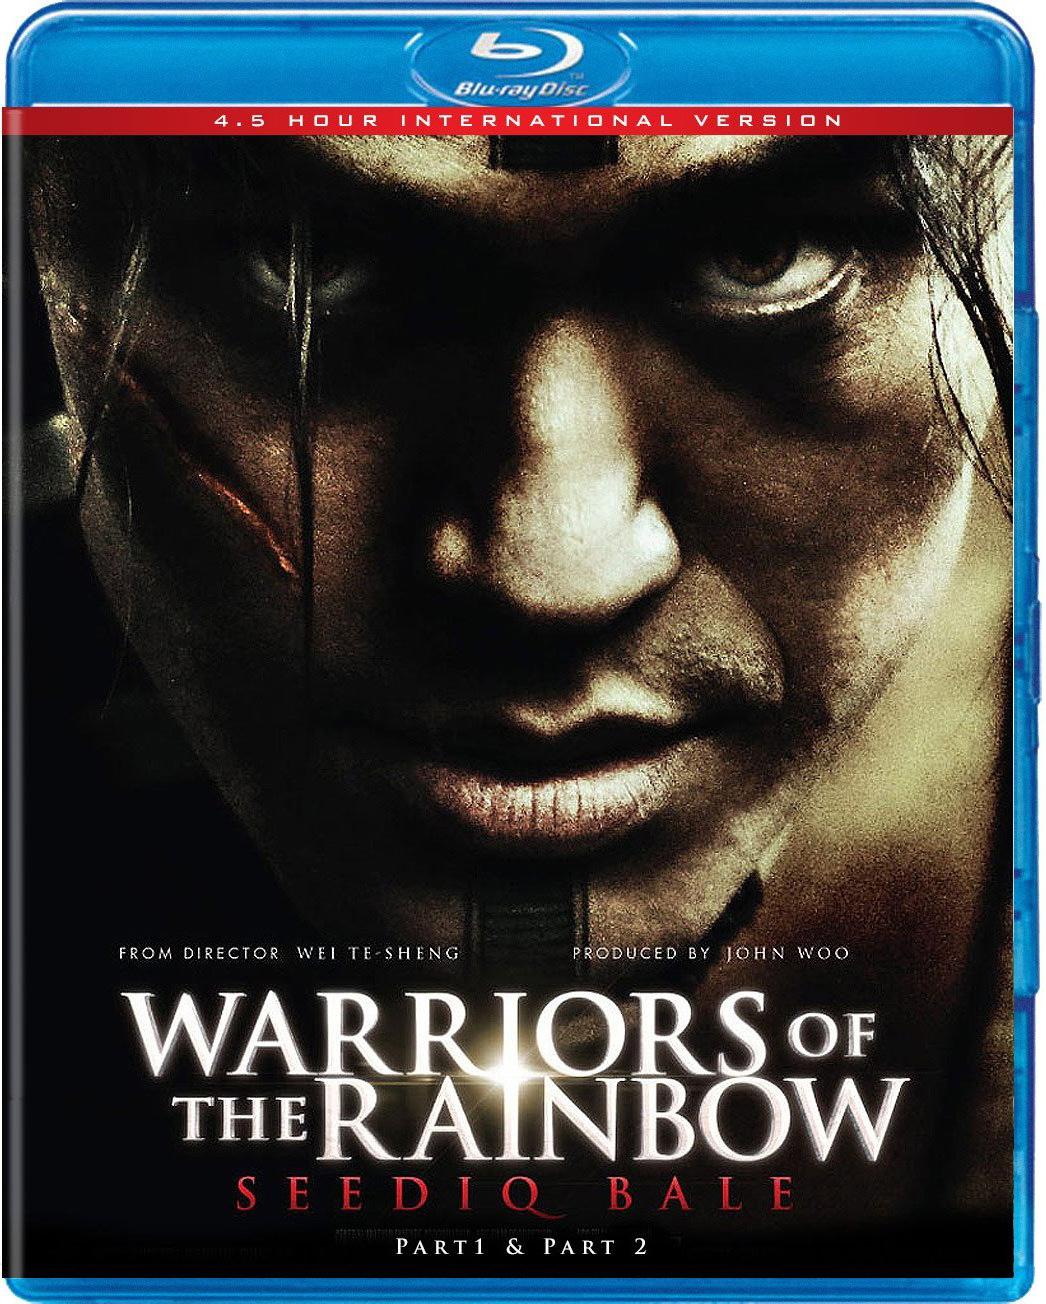 Warriors Of The Rainbow Tribe: I, Write, Riot: Warriors Of The Rainbow: Seediq Bale